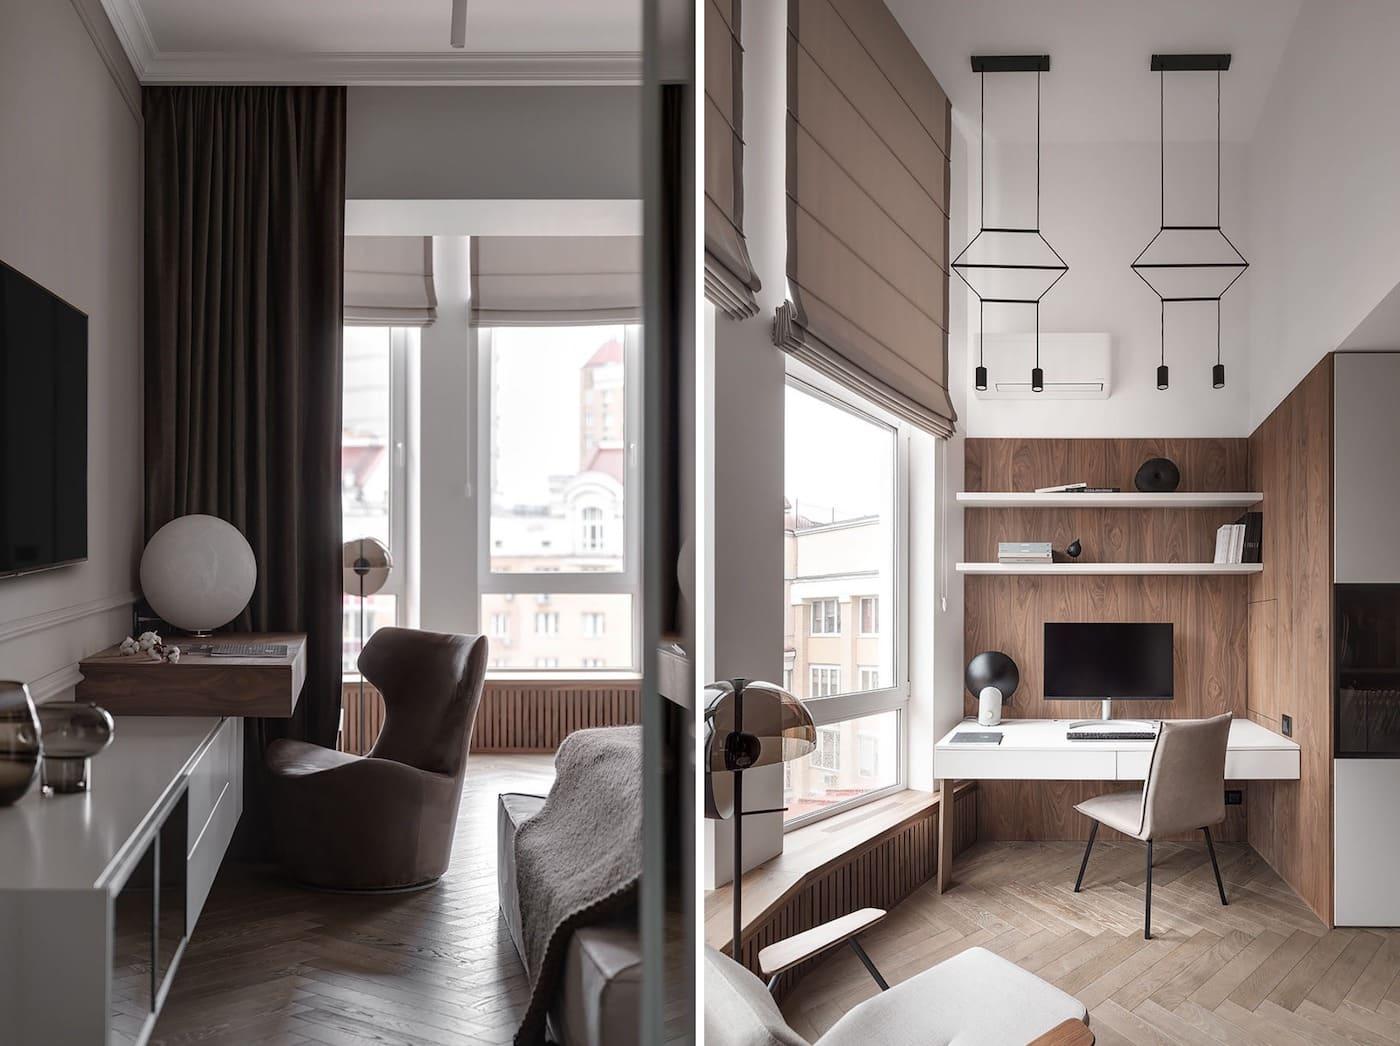 дизайн интерьера модной квартиры фото 56